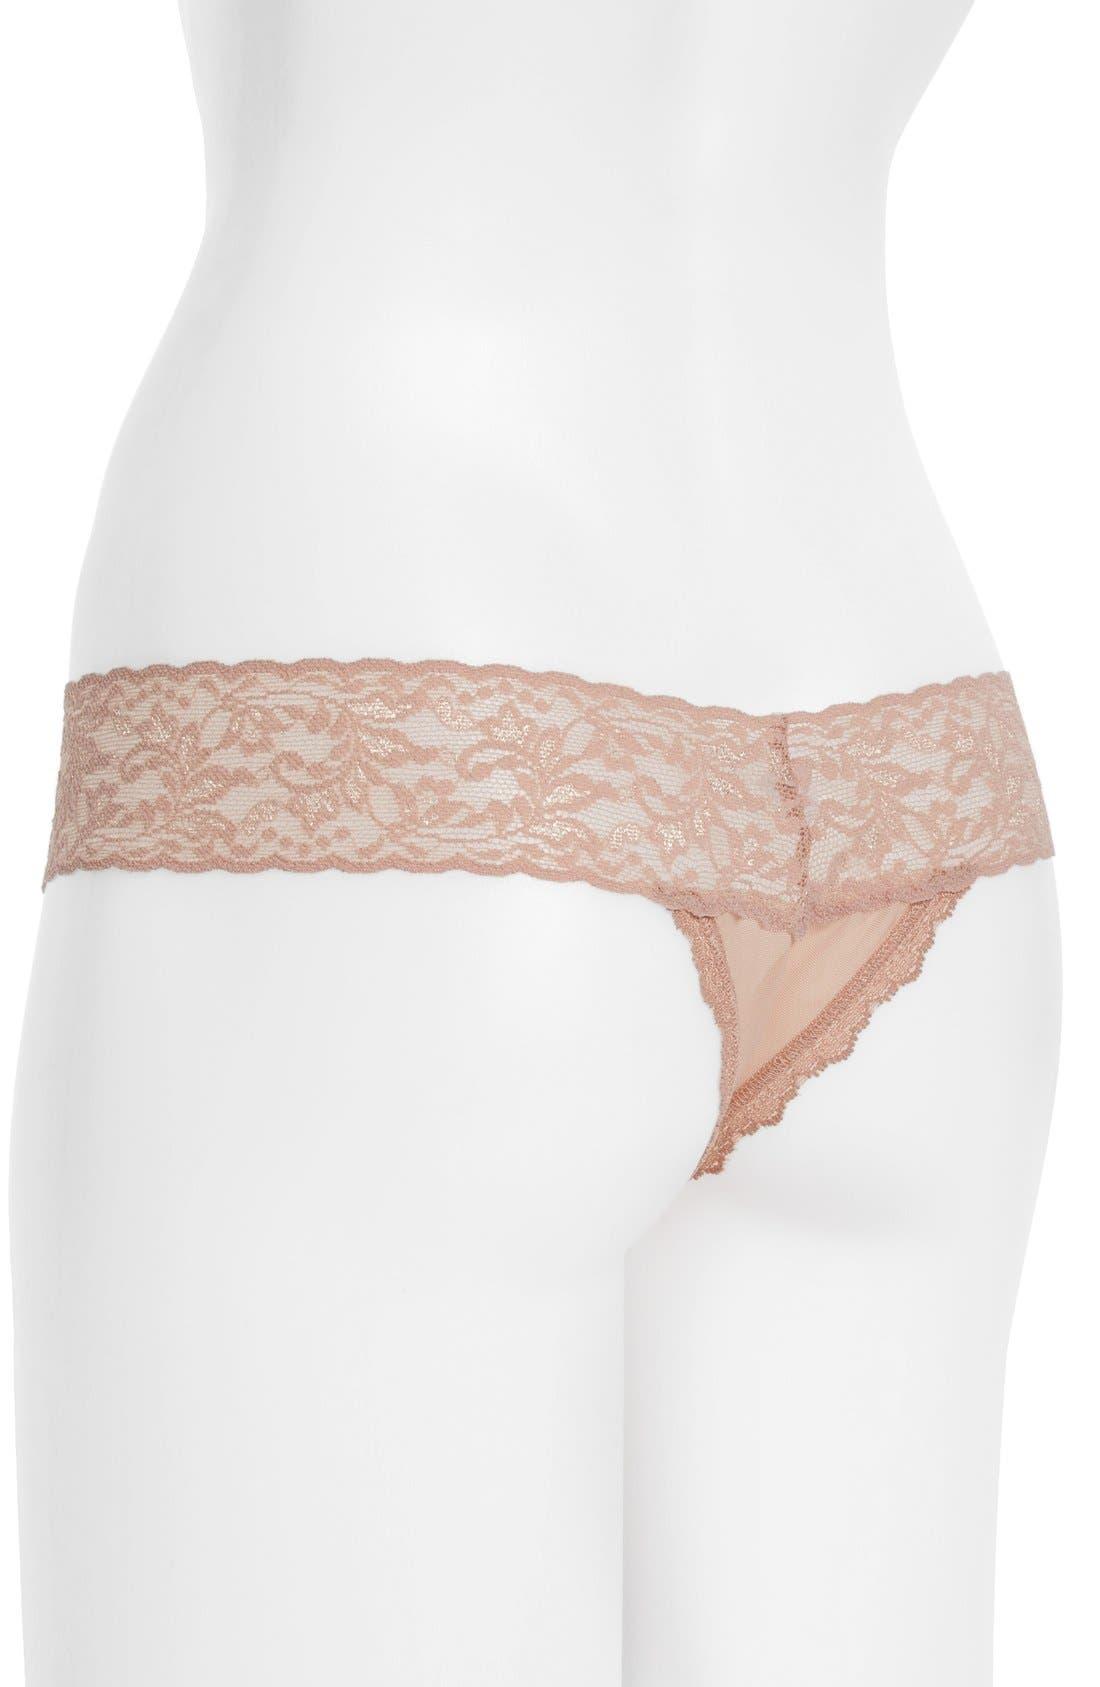 Alternate Image 2  - Hanky Panky 'Luscious Rose' Lace Thong